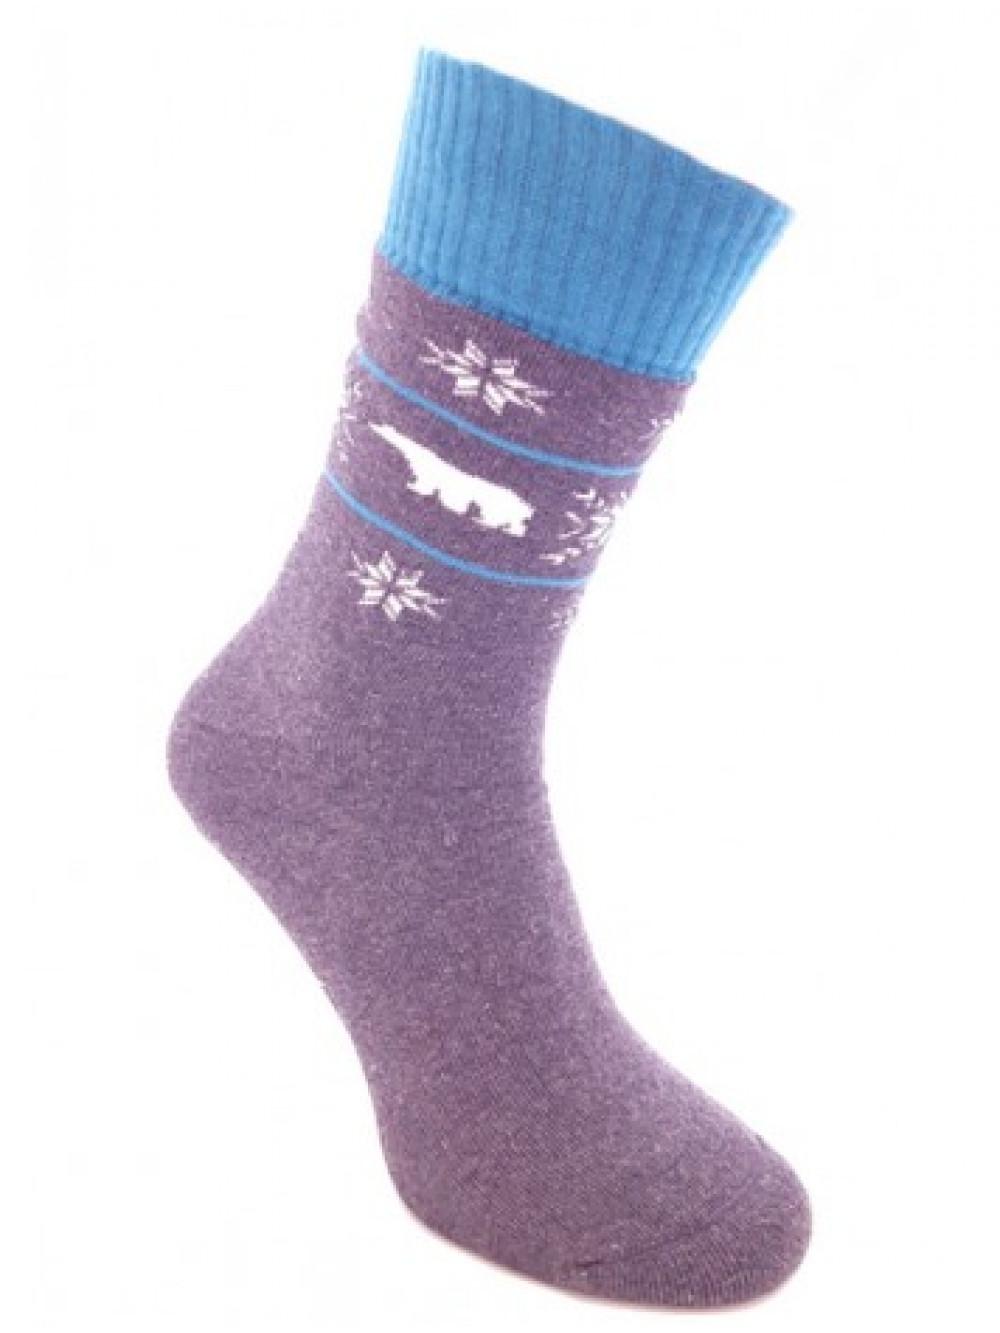 Ponožky Foxysoxy Ľadový medveď